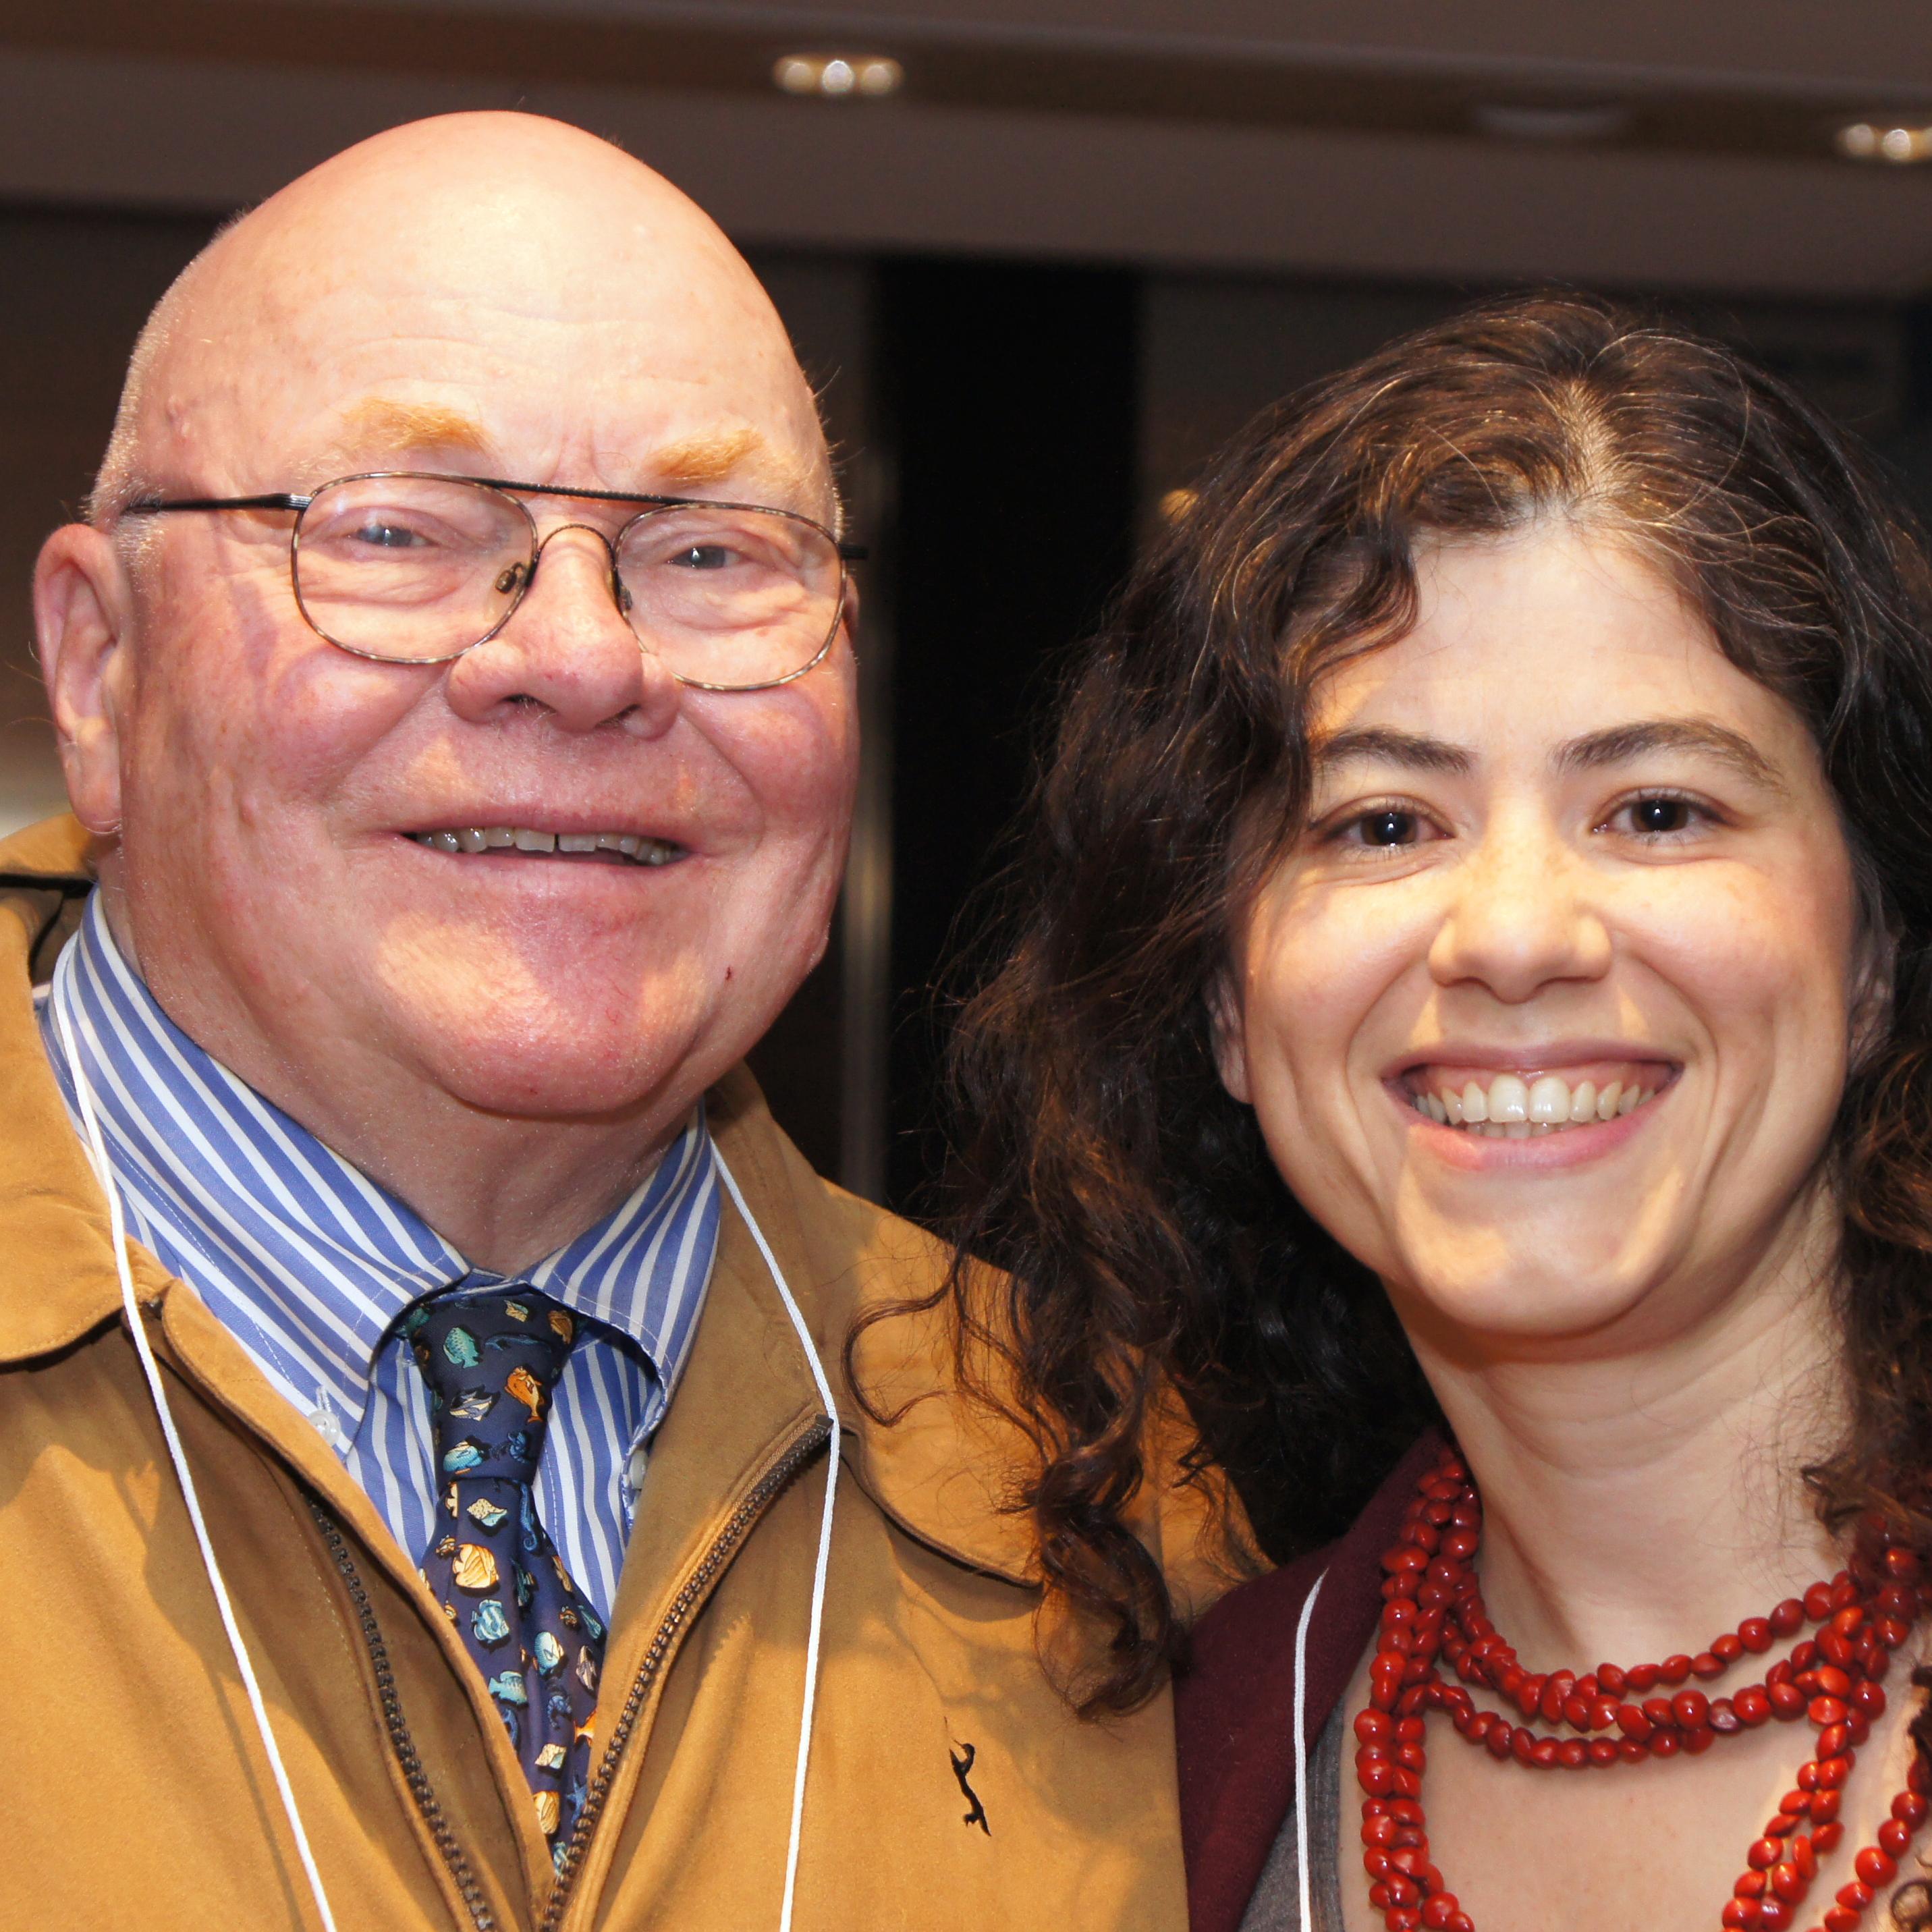 Robert Cluett & Franca Gucciardi